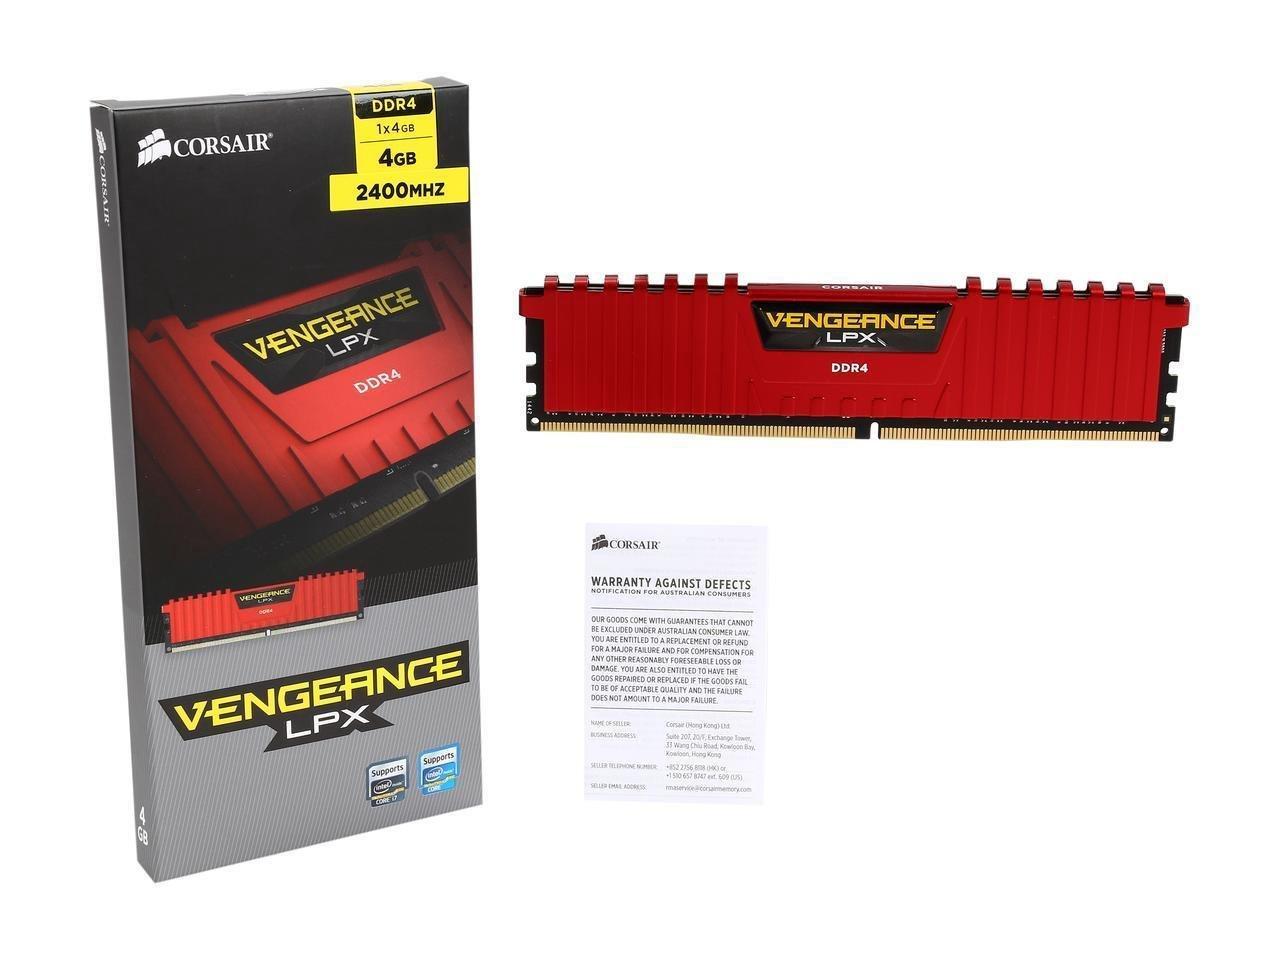 Corsair CMK4GX4M1A2400C14R Vengeance LPX 4 GB (1 x 4 GB) DDR4 2400 MHz C14 XMP